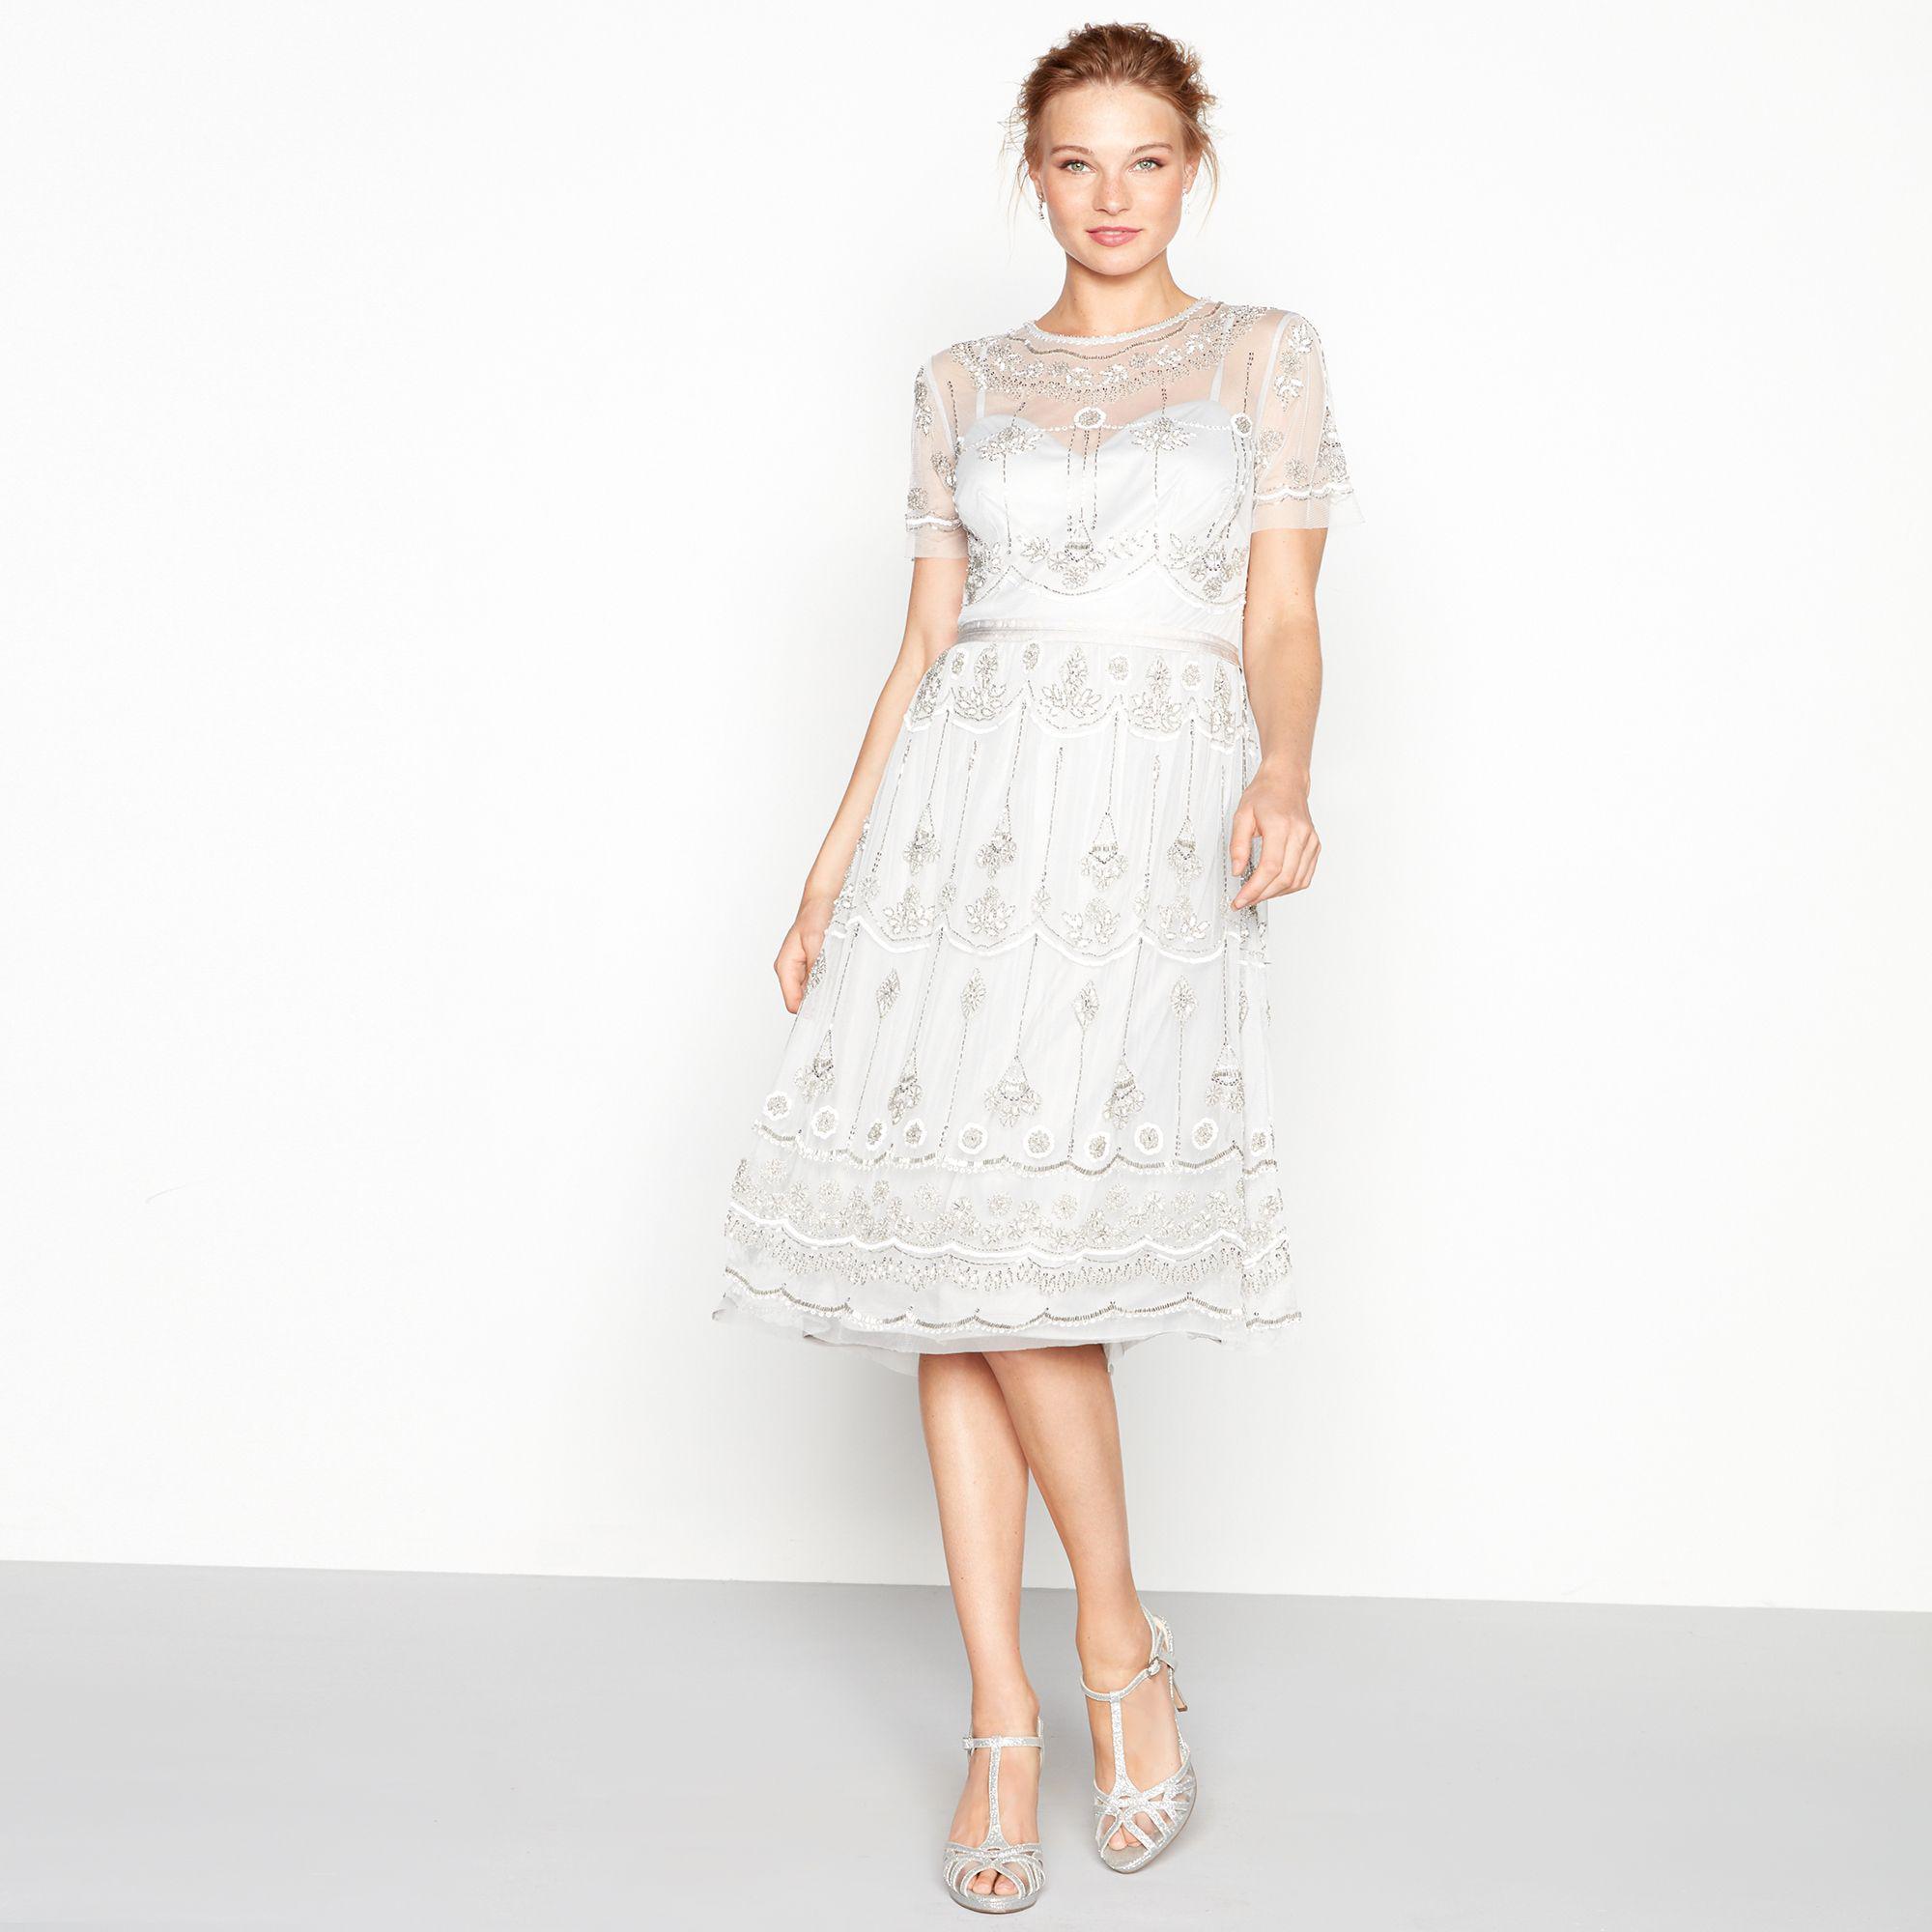 77519d1f970 Jenny Packham. Women s Metallic Silver Embroidered Round Neck Short Sleeve  Midi Evening Dress